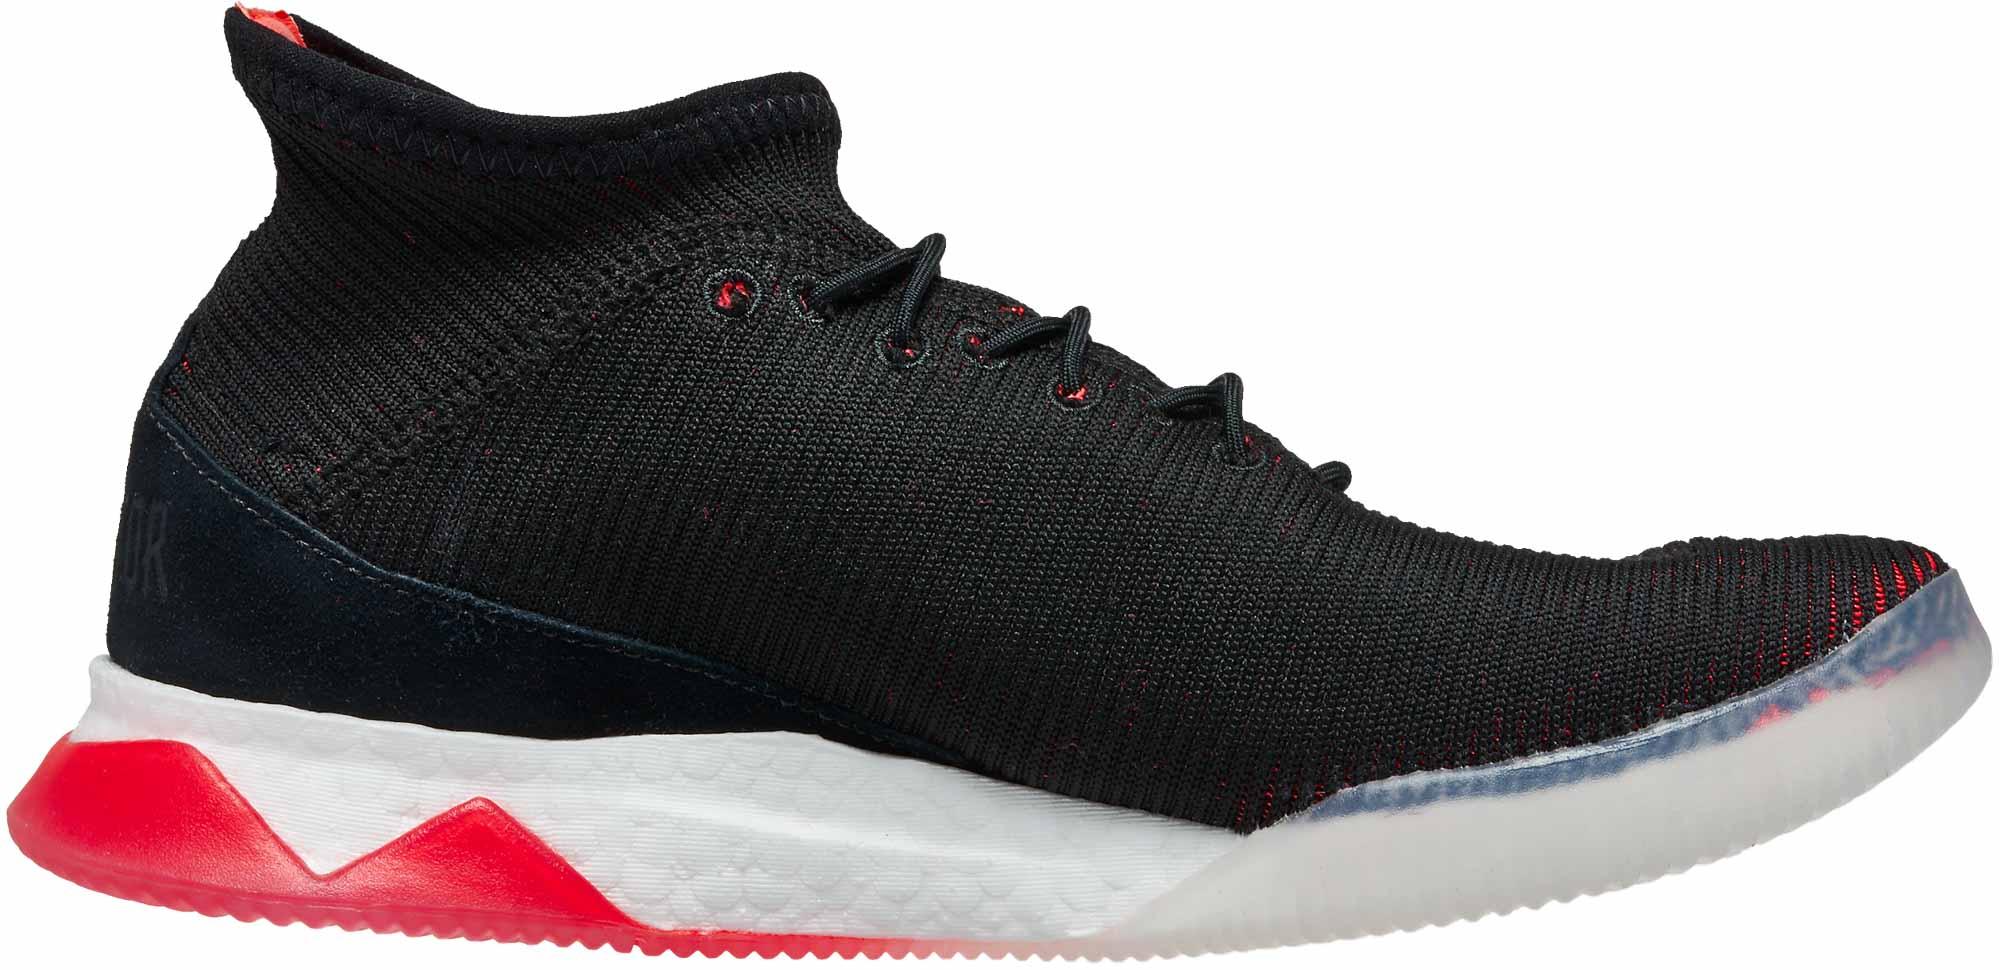 Adidas Predator Tango Zapatos De Estilo De Vida 18,1 Tr